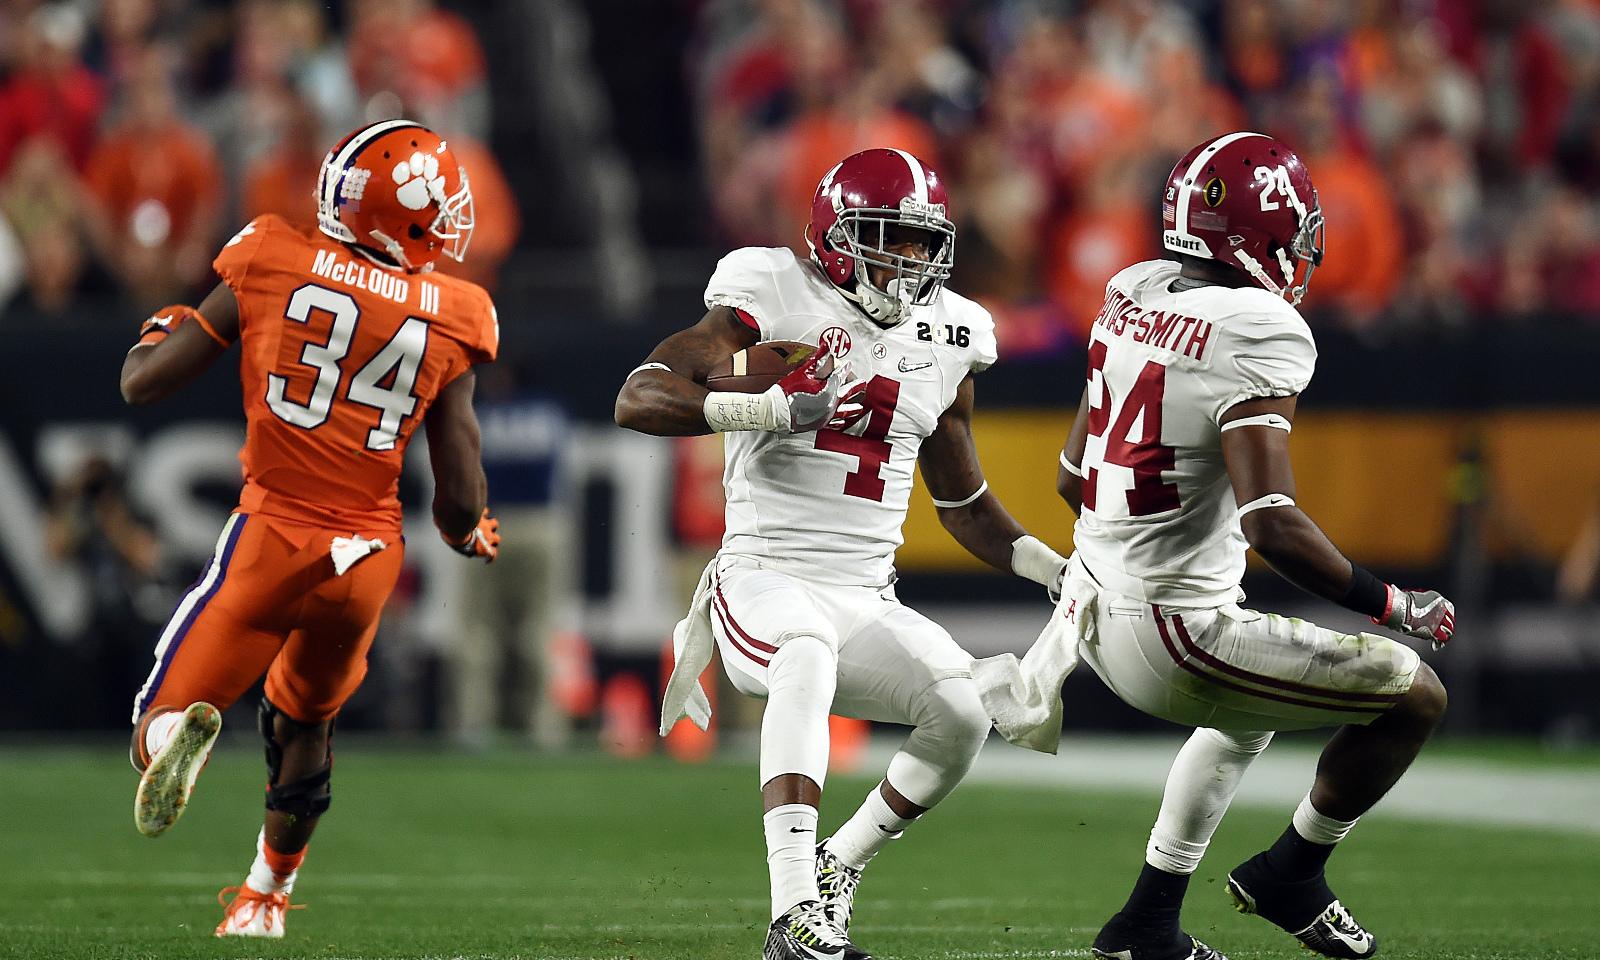 Alabama Football Lands 13 Players On 2016 Preseason Coaches All Sec